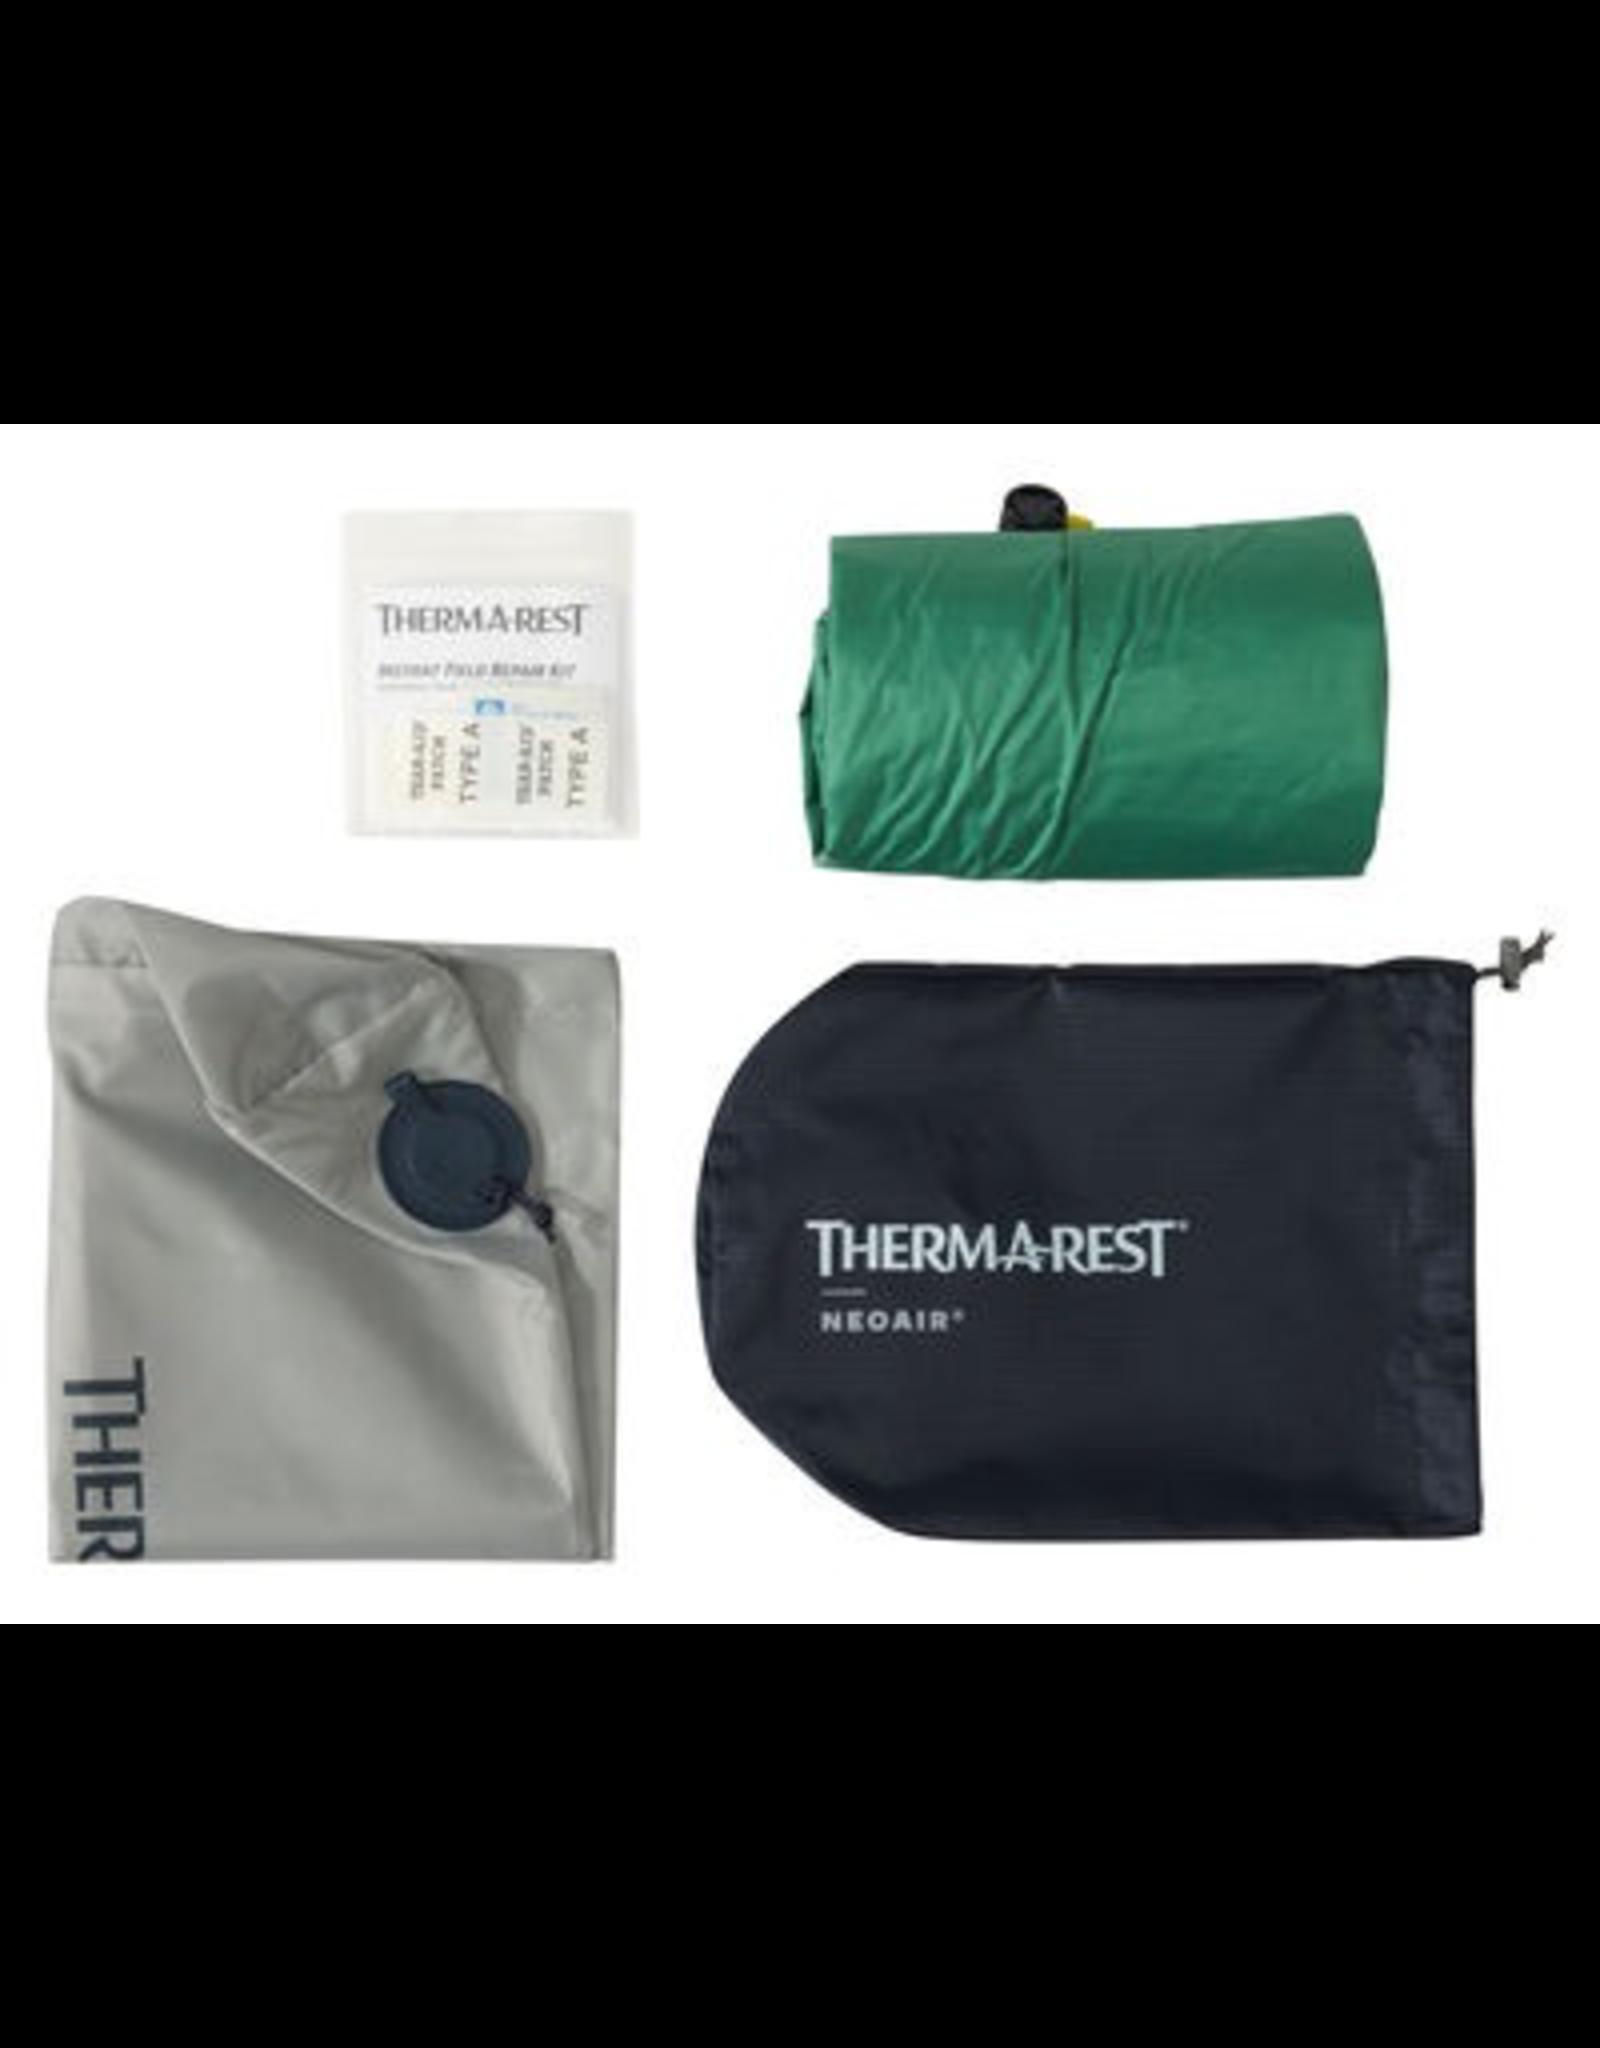 Thermarest Thermarest Neoair Venture Pine Regular